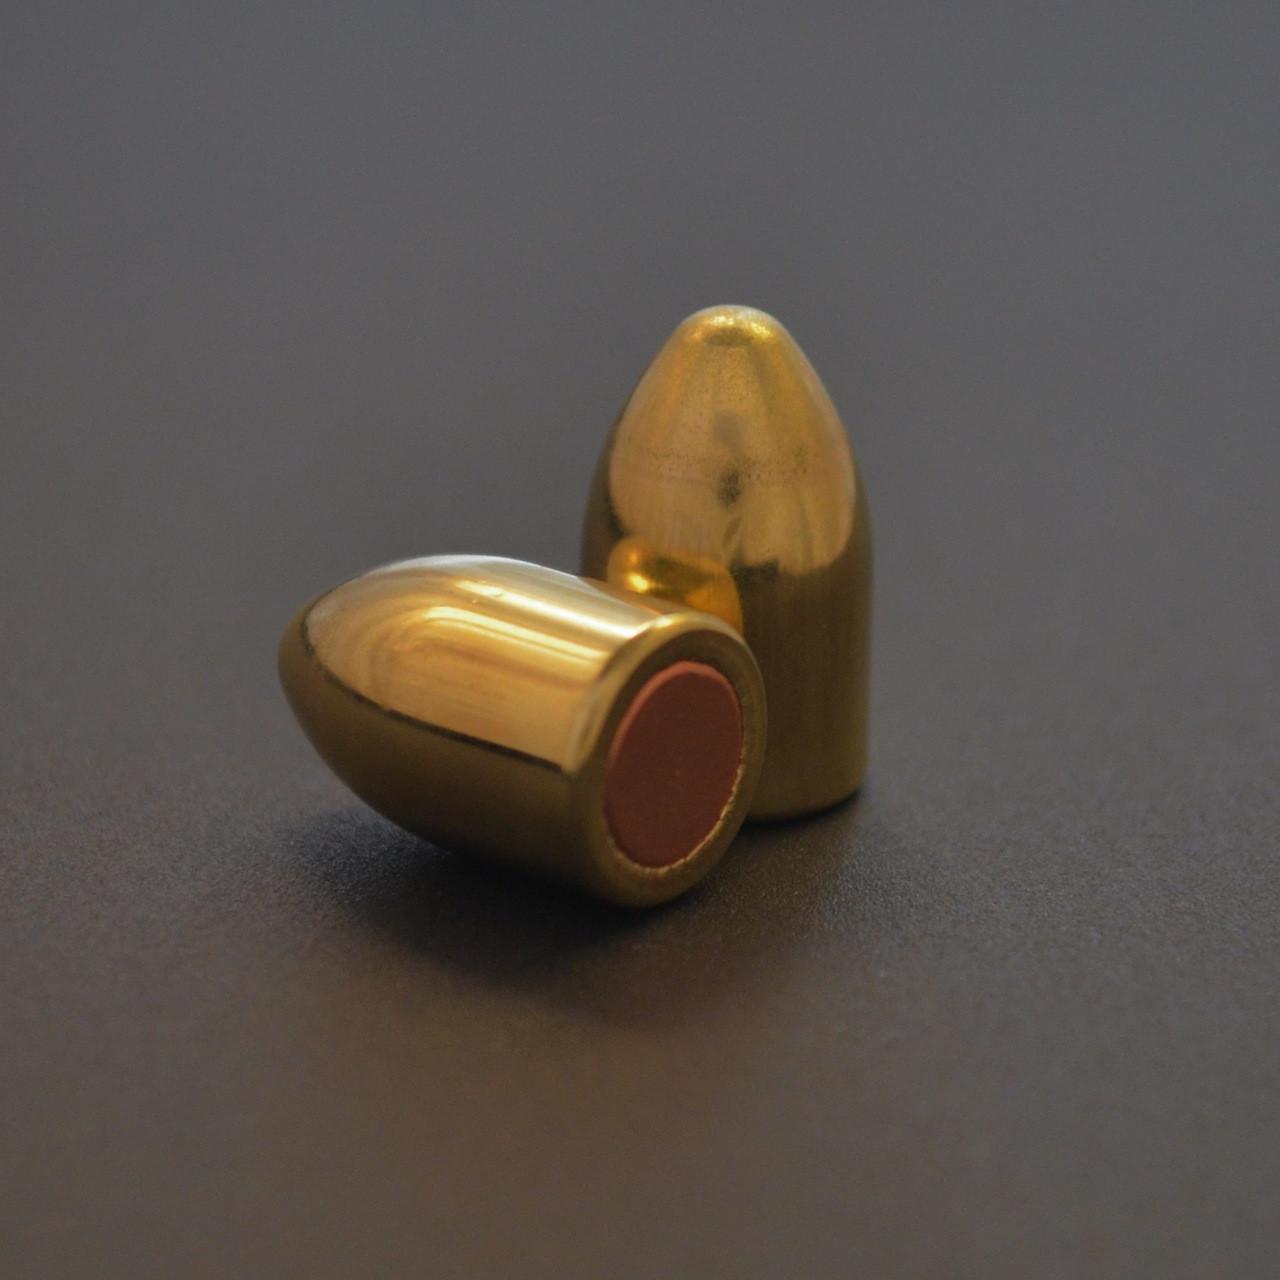 9mm/124gr CMJ -500ct